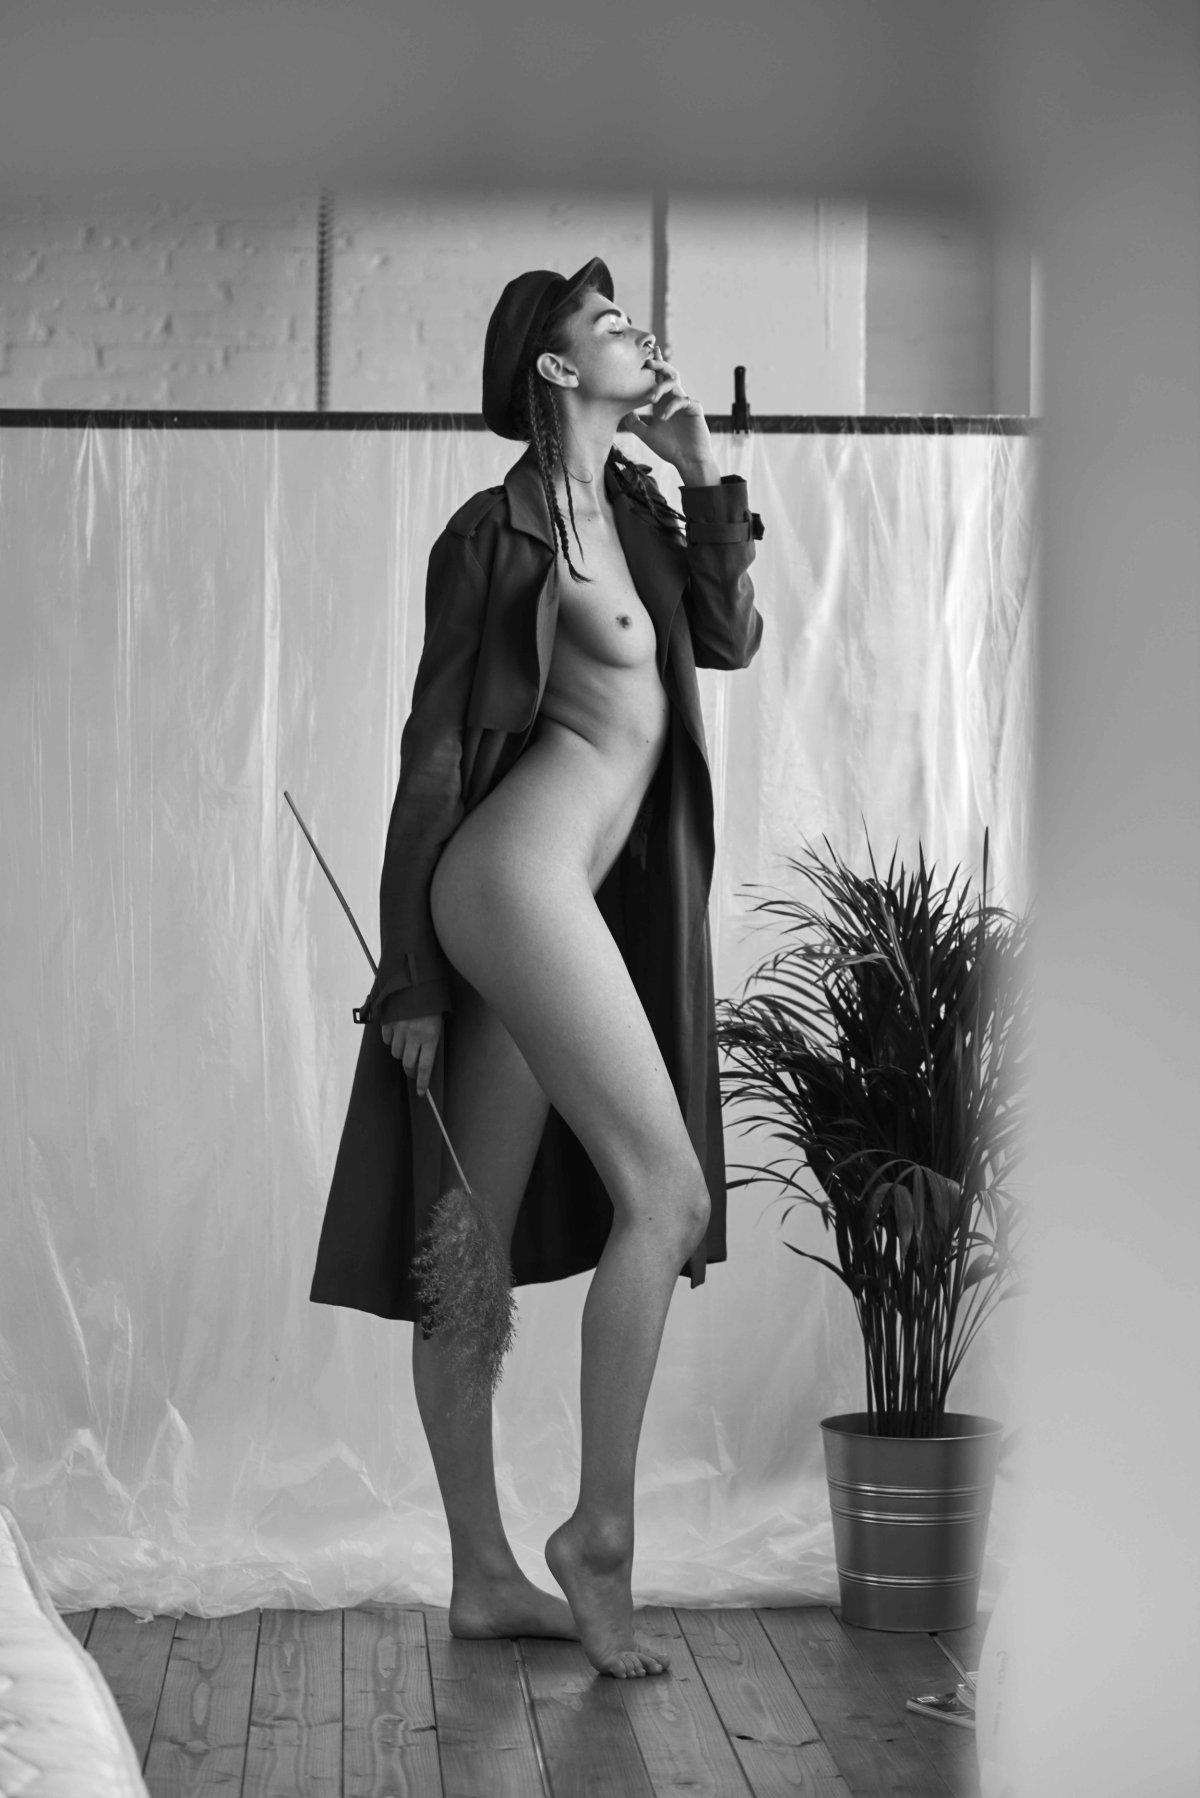 Tara Lilly by Ruben Suarez